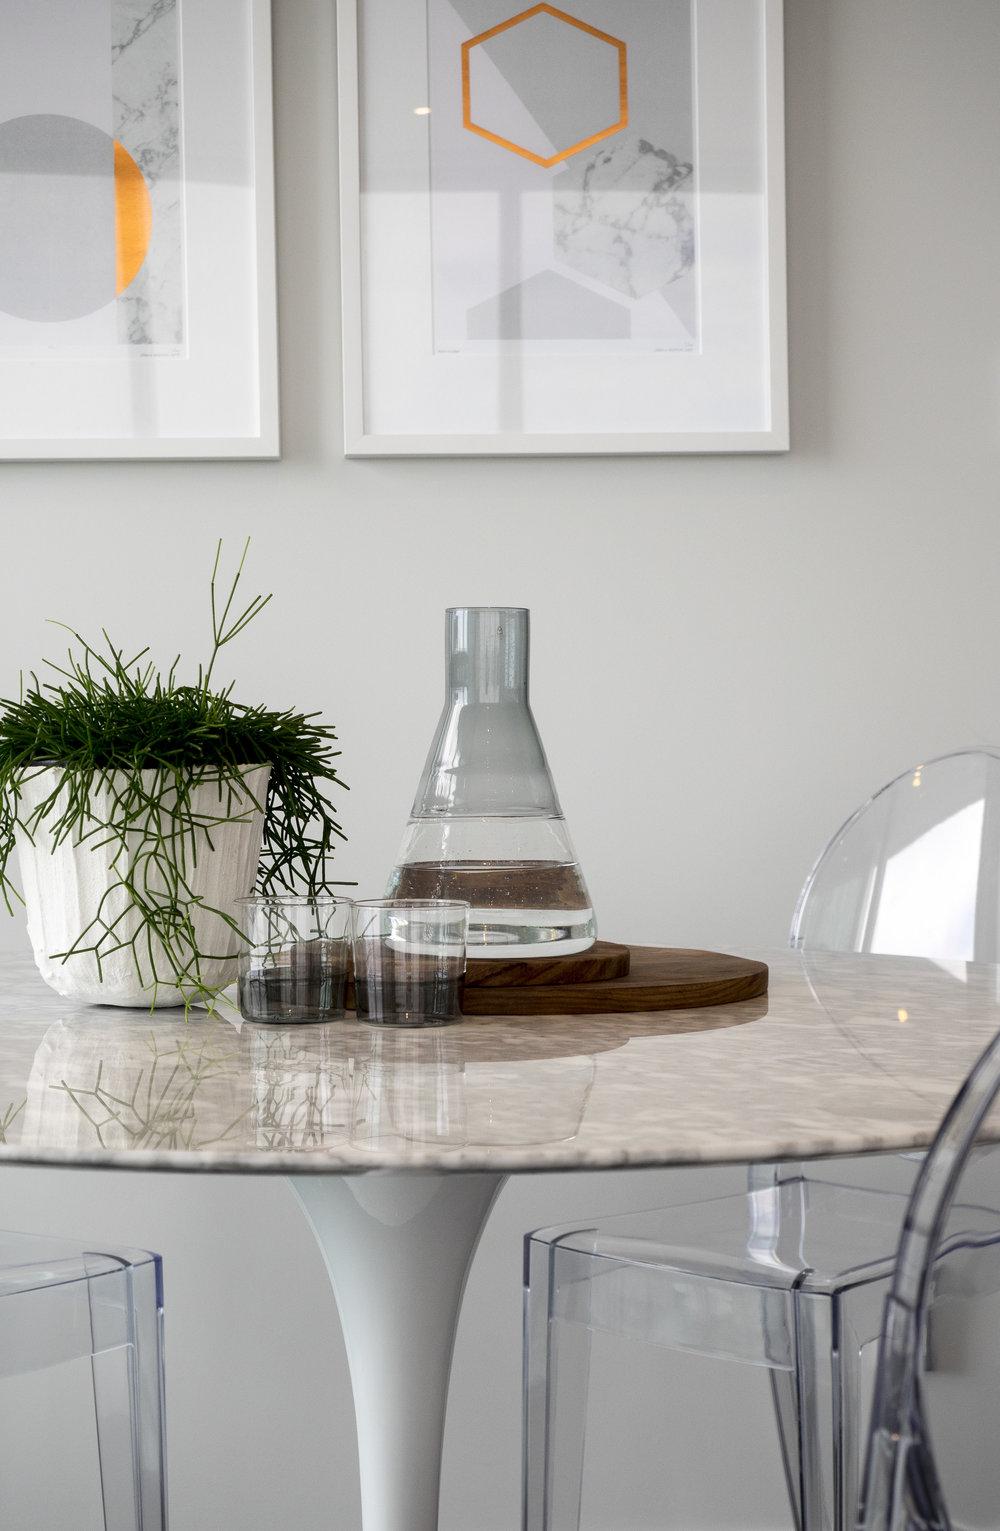 Sonya Cotter Design - Contempoary Furniture Design & Decor Auckland